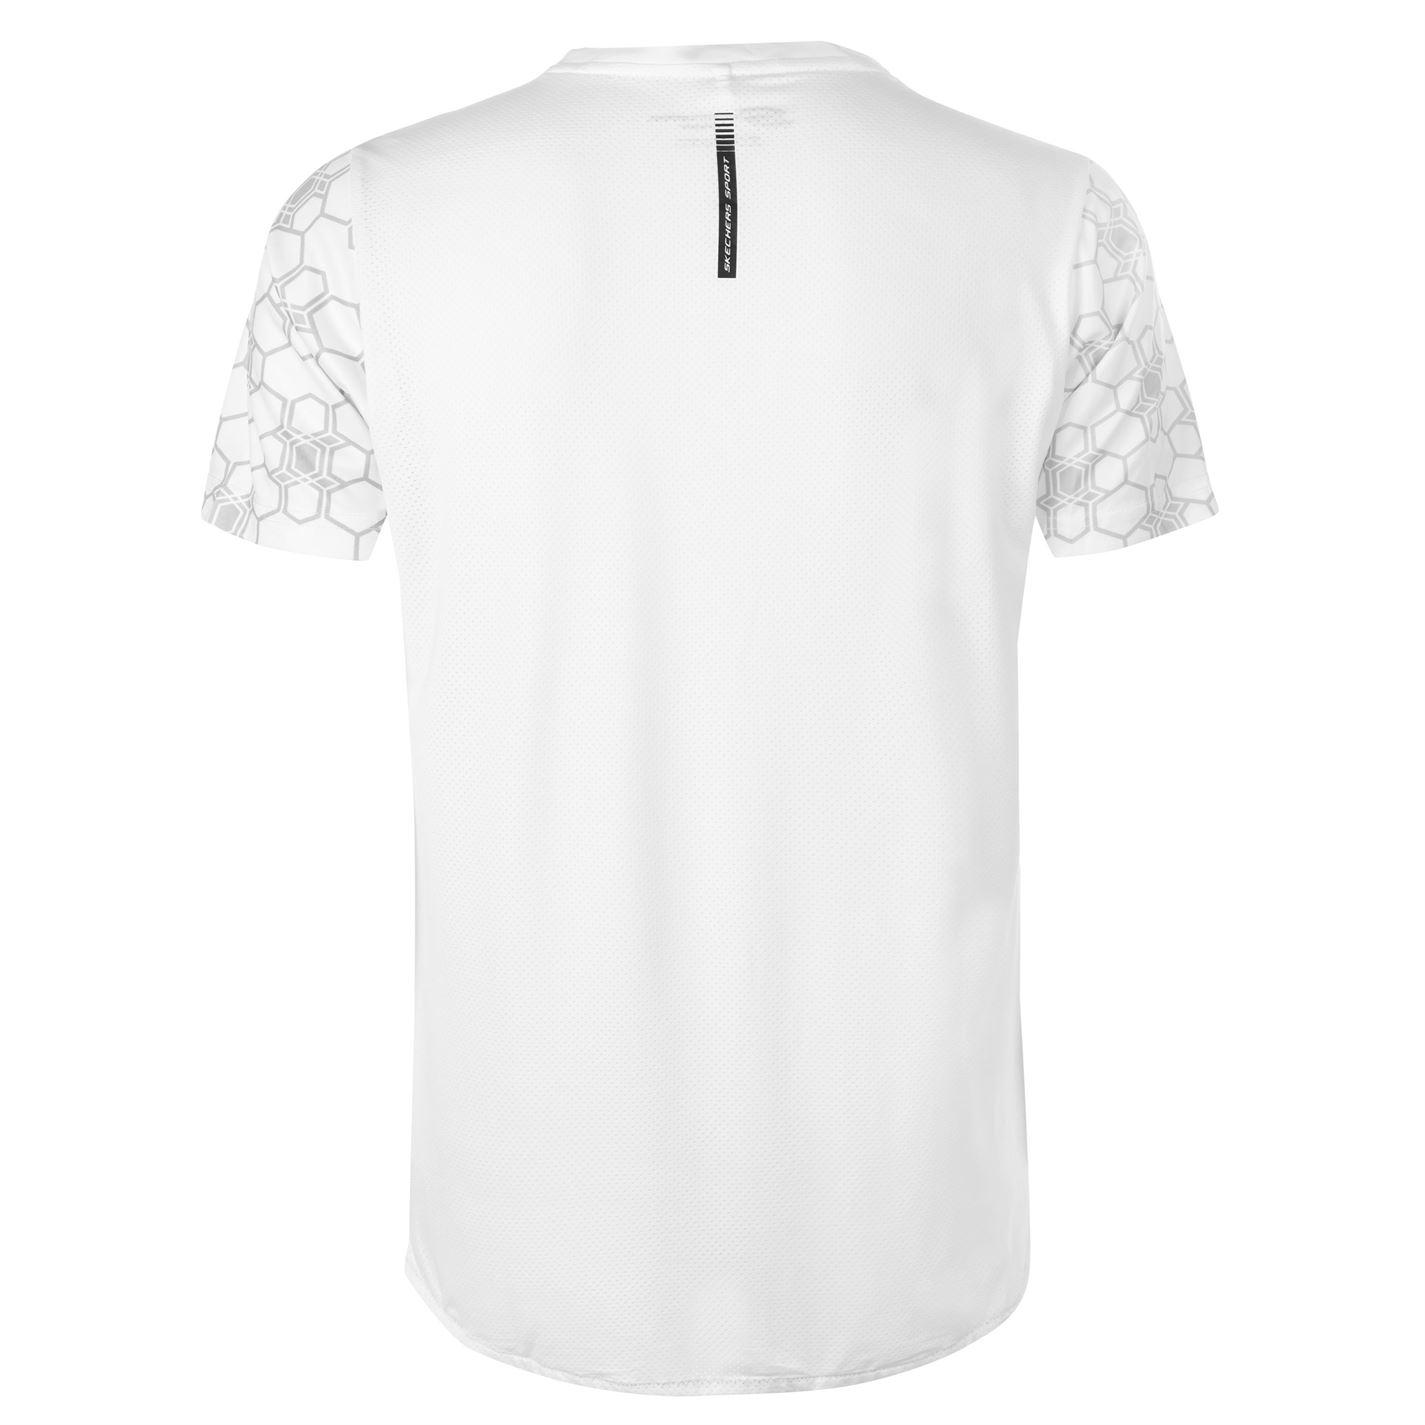 Skechers-Mens-Aop-Camiseta-Mangas-Cortas-Cuello-Redondo-Camiseta-Top-Performance miniatura 5